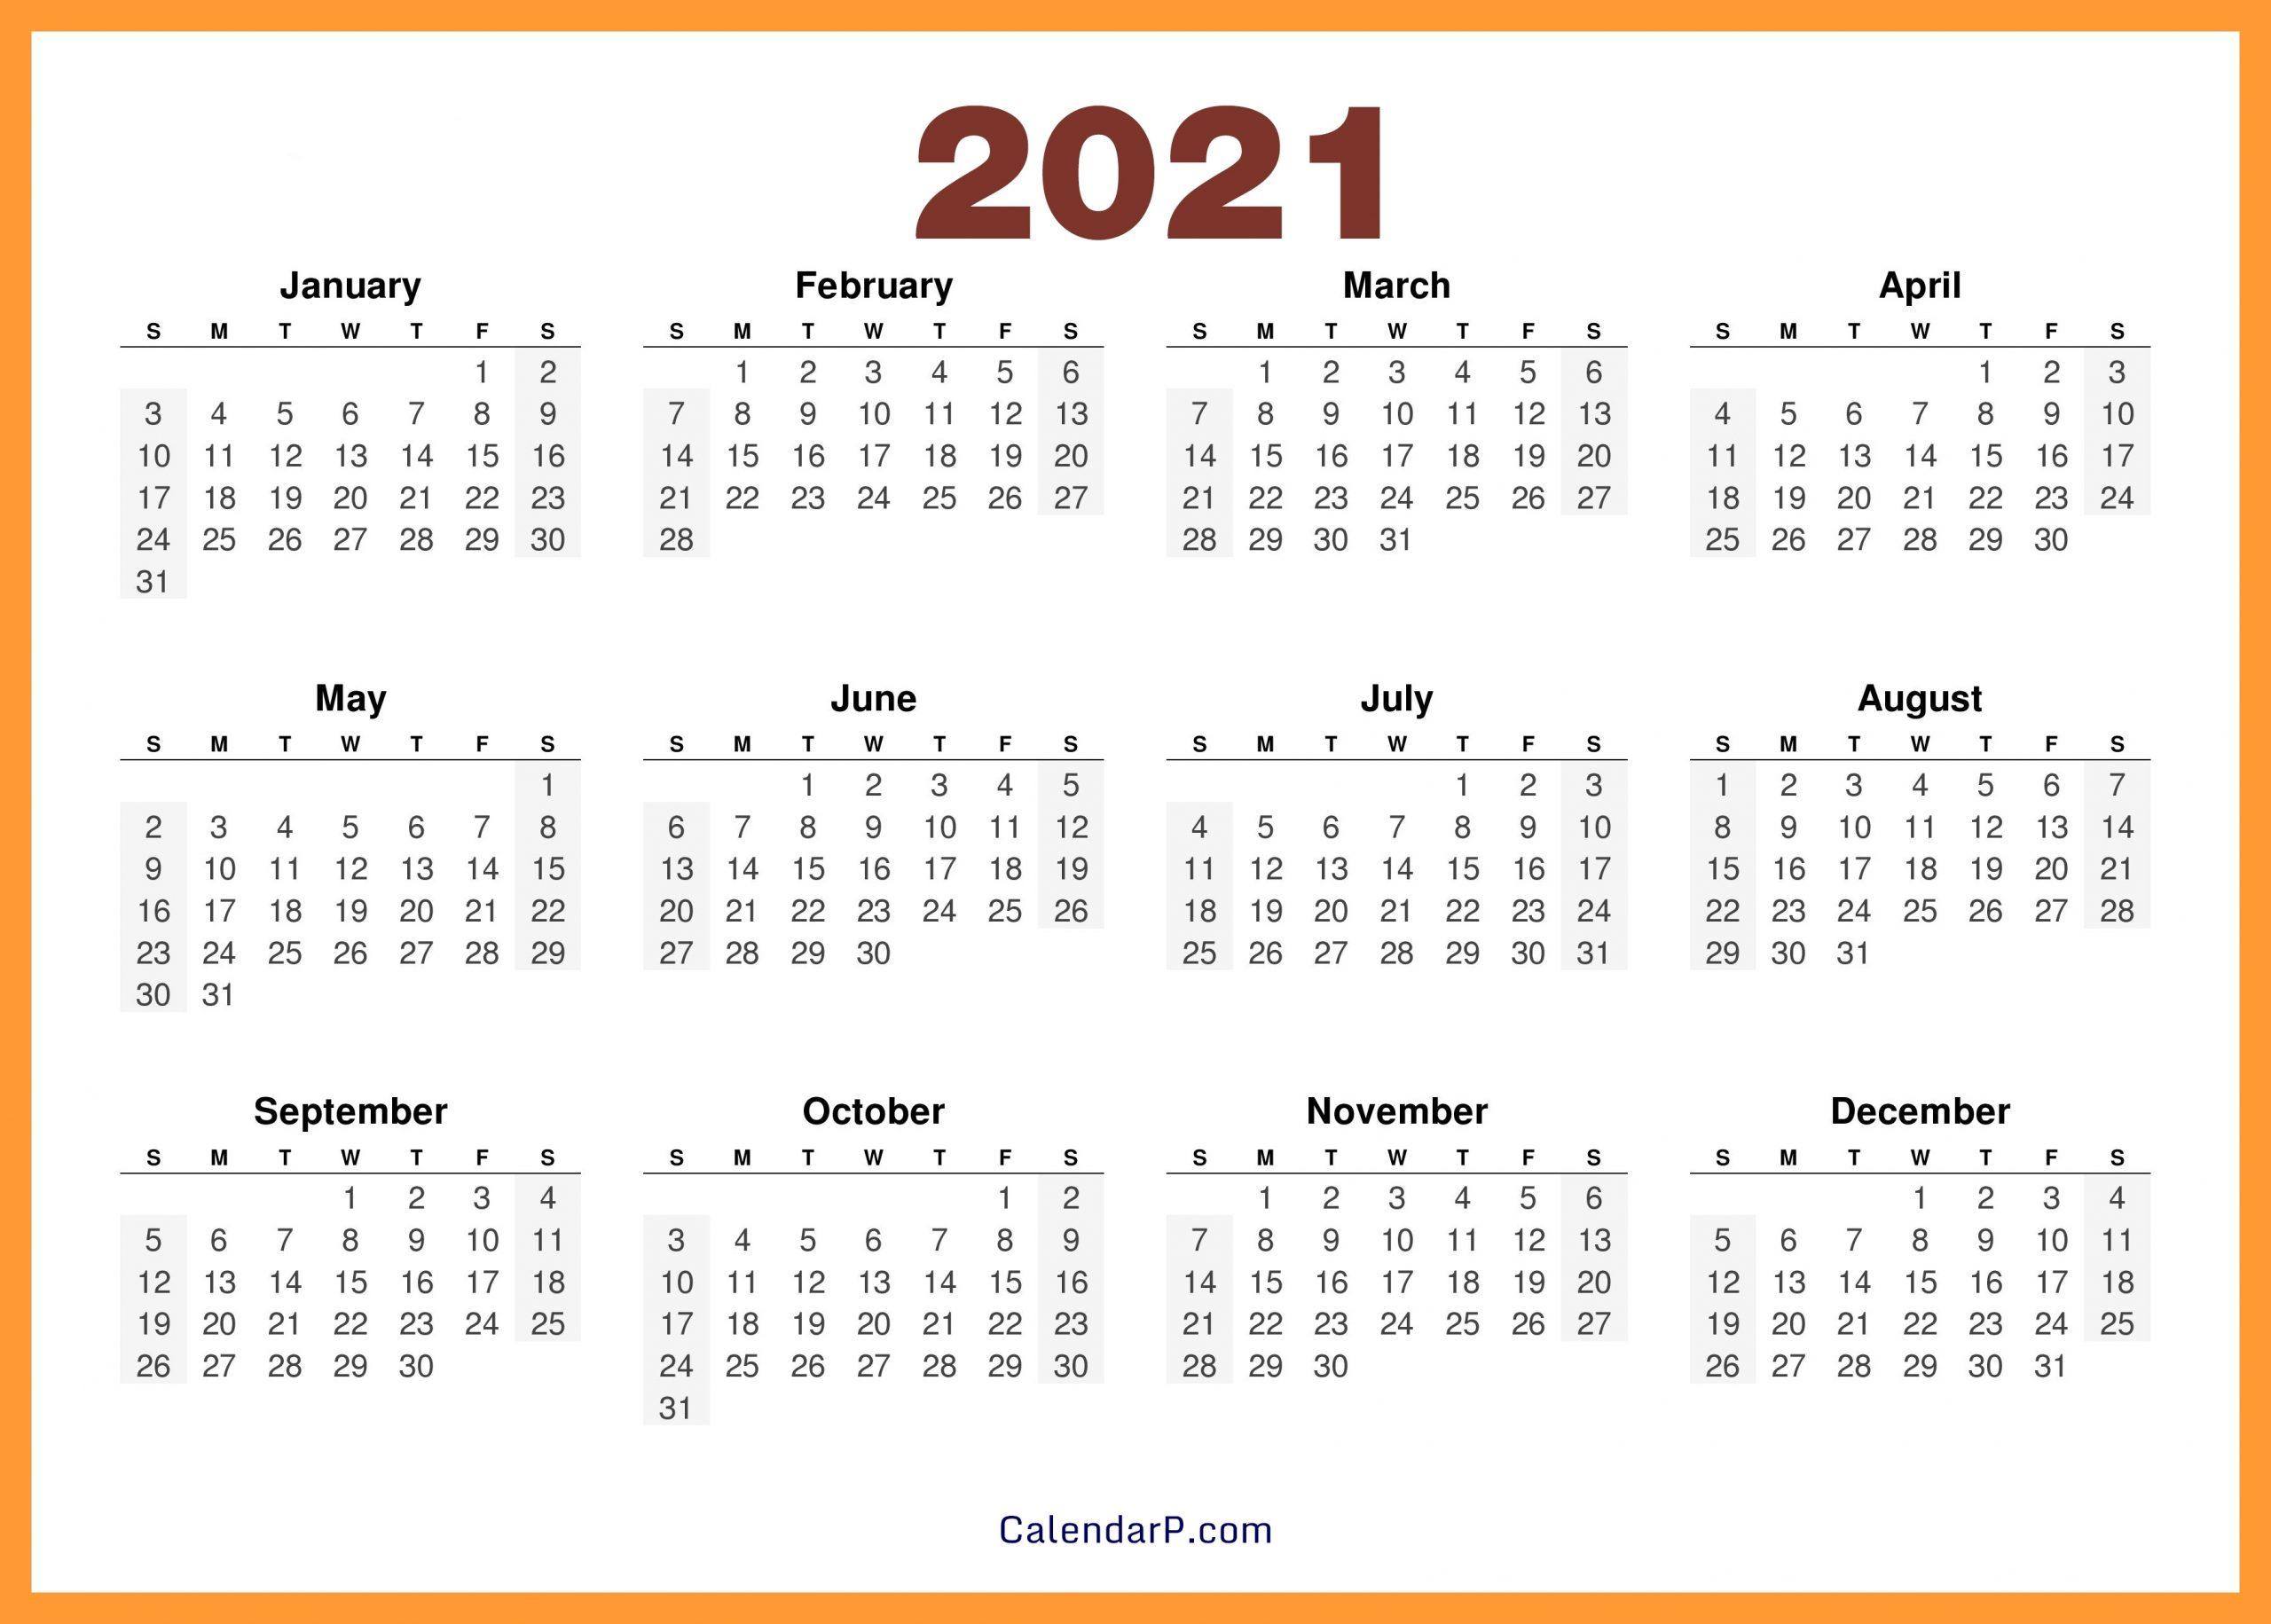 2021 Calendar Printable Free, Hd - Orange - Calendarp | Printable Free Calendars